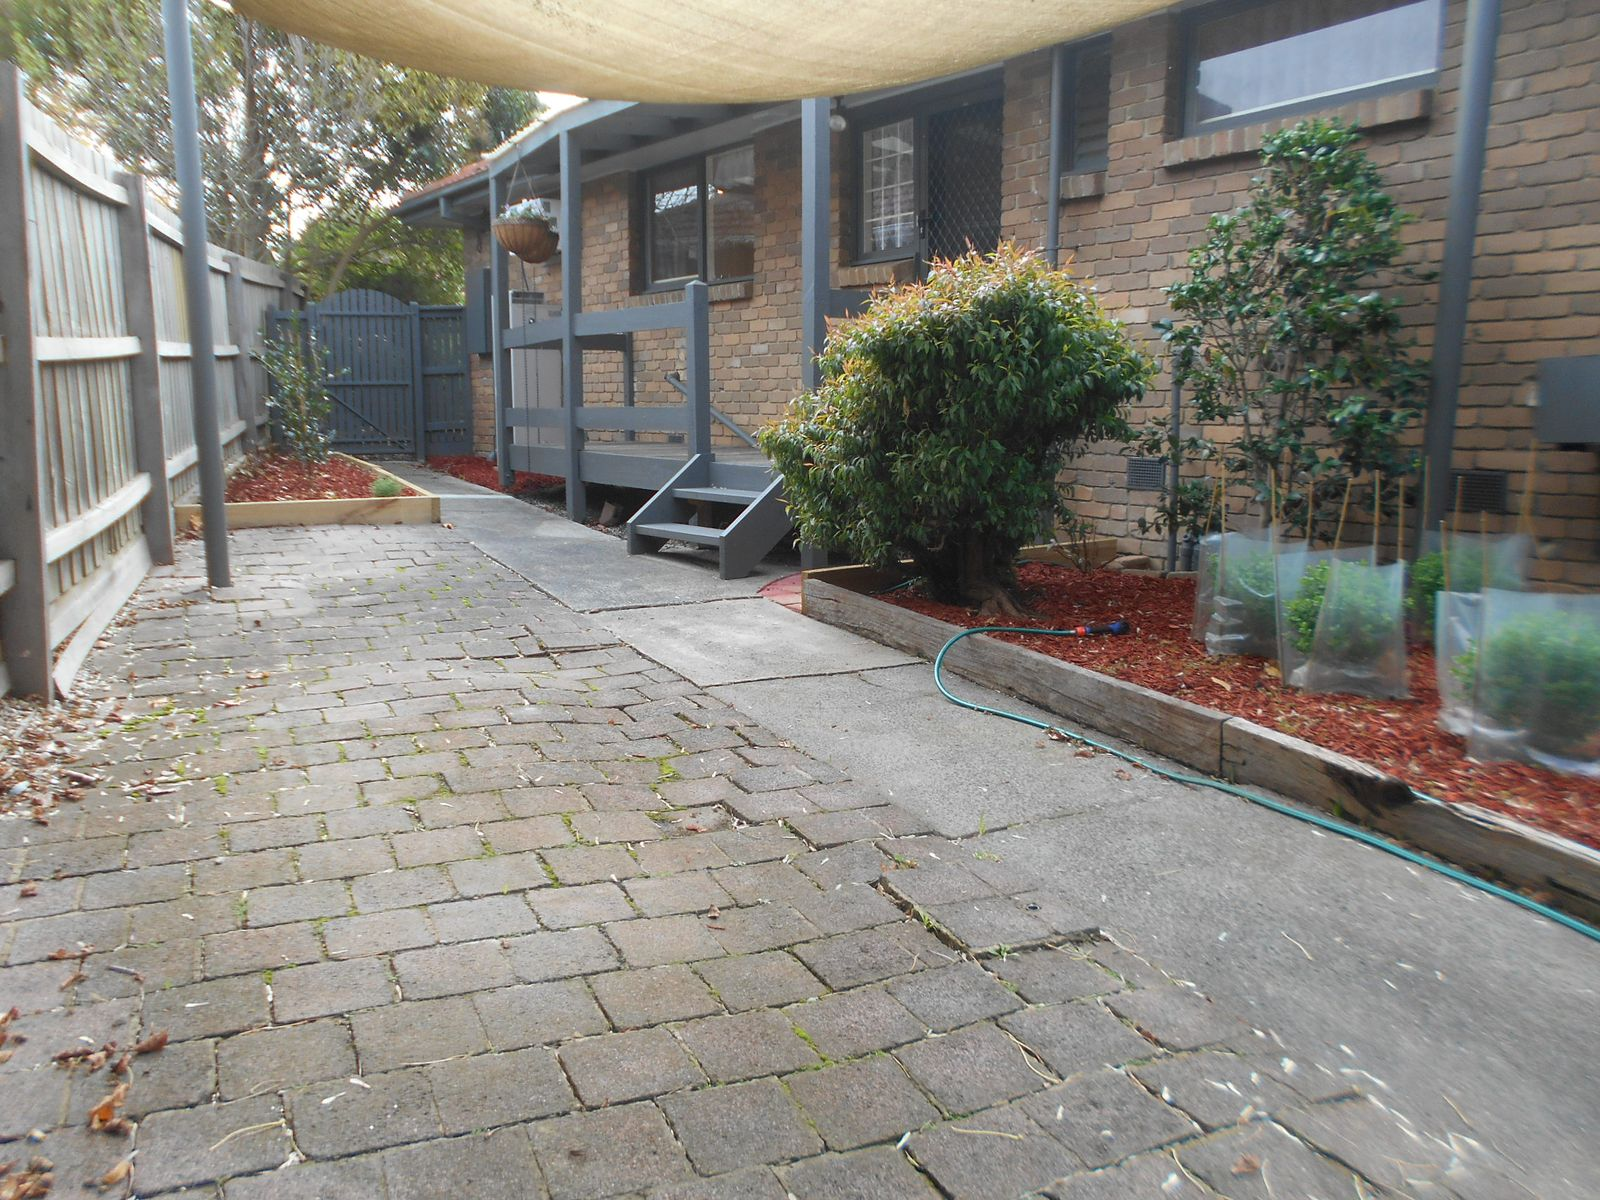 17 George Street, Scoresby, VIC 3179